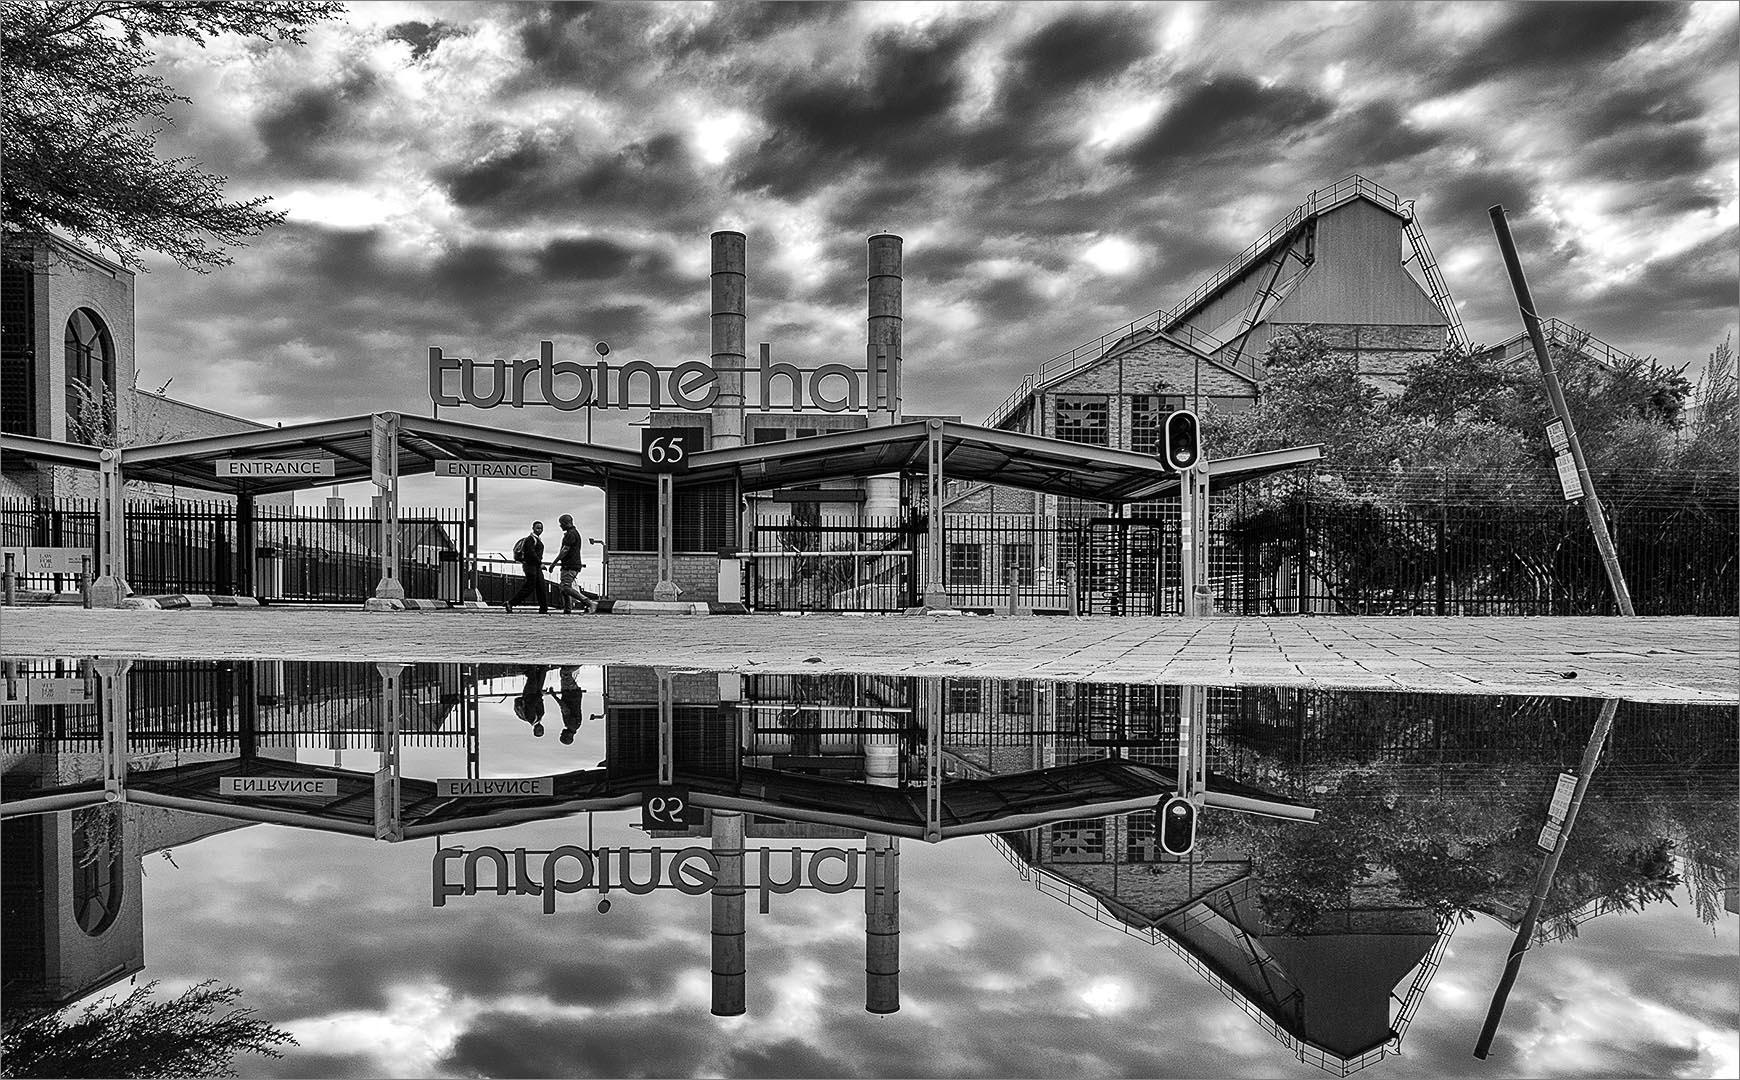 4_PI_The Turbine Hall_Clare Appleyard